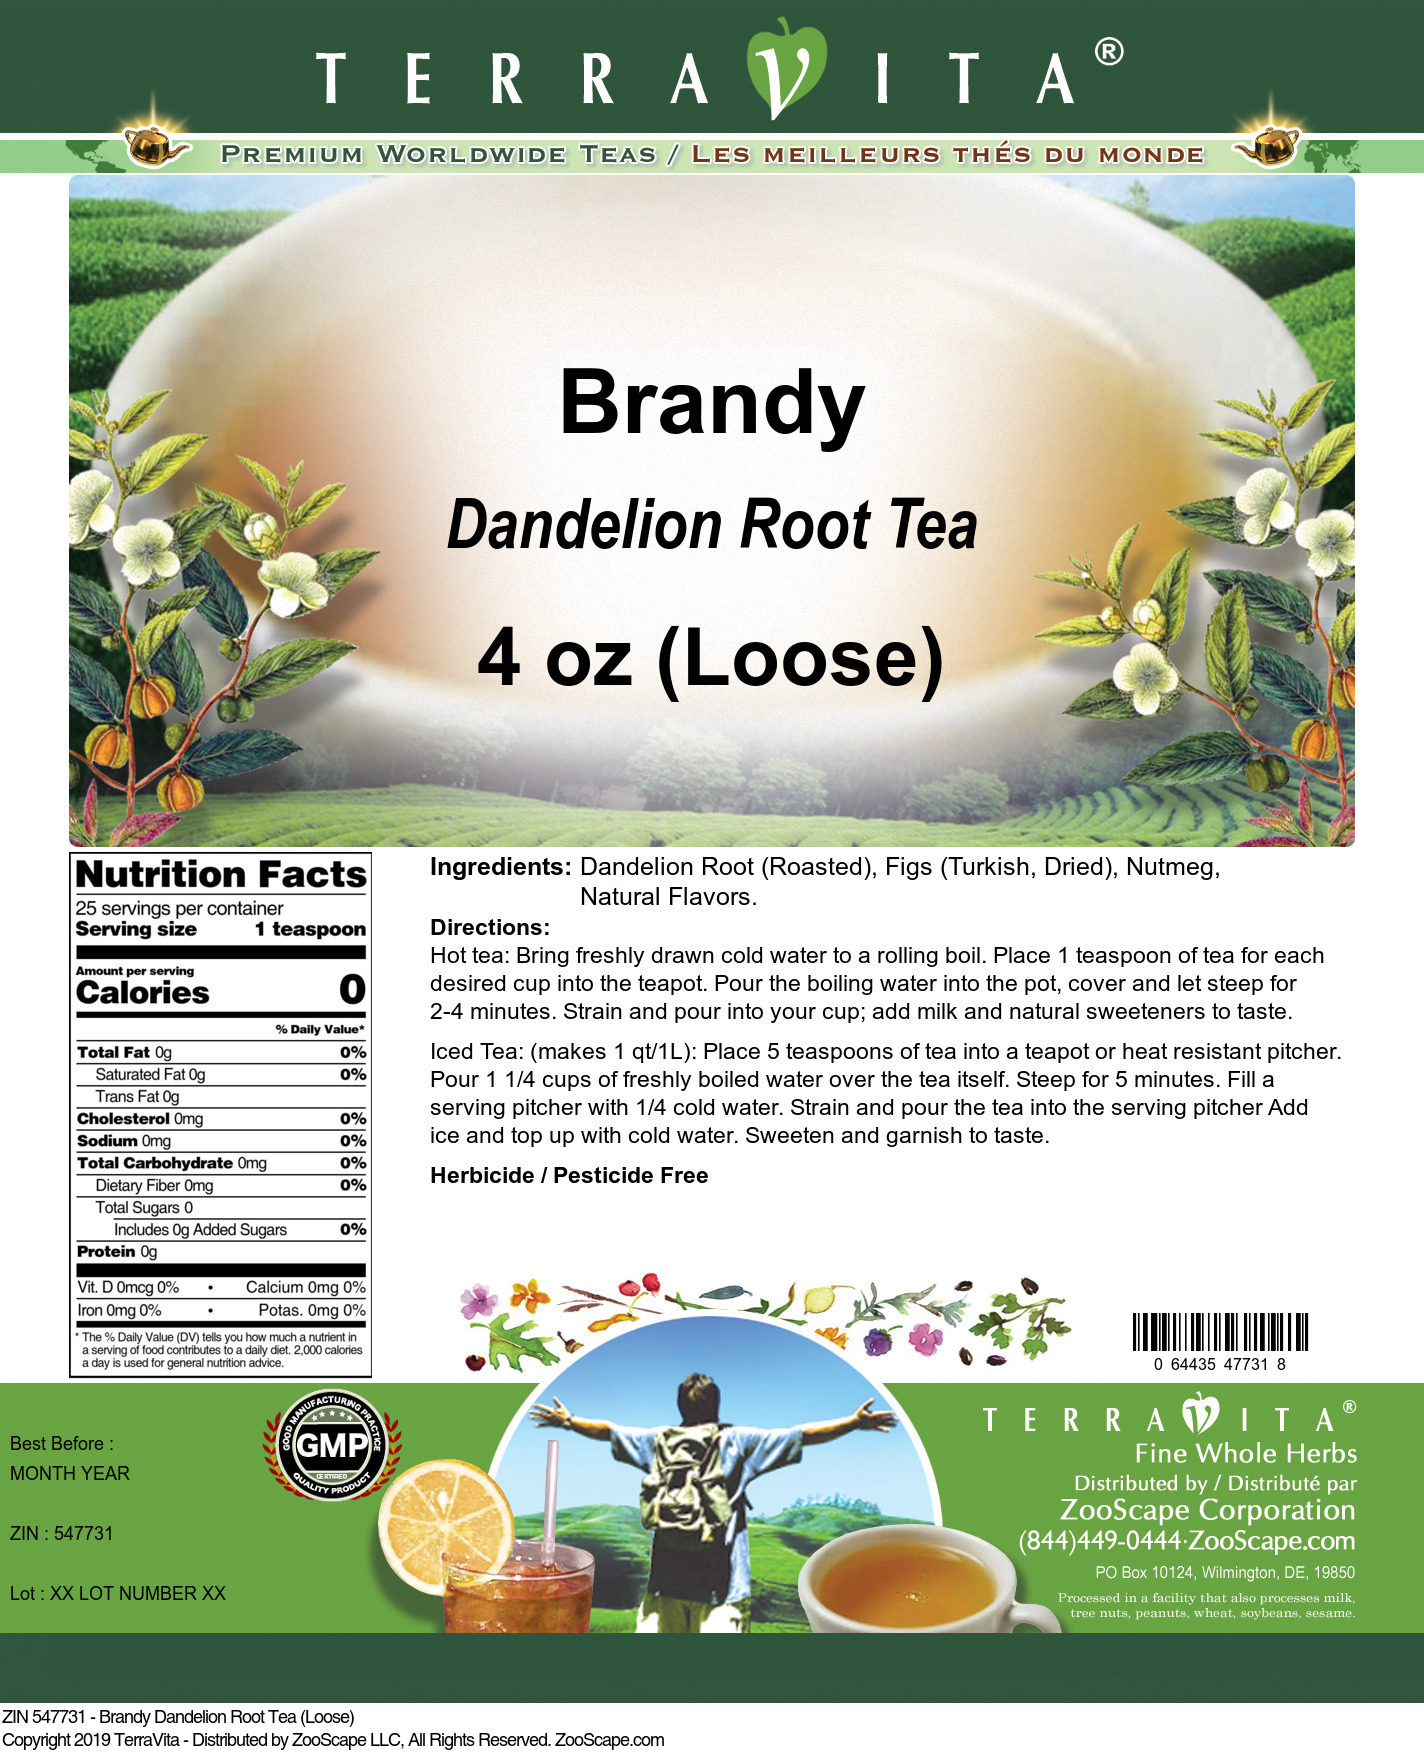 Brandy Dandelion Root